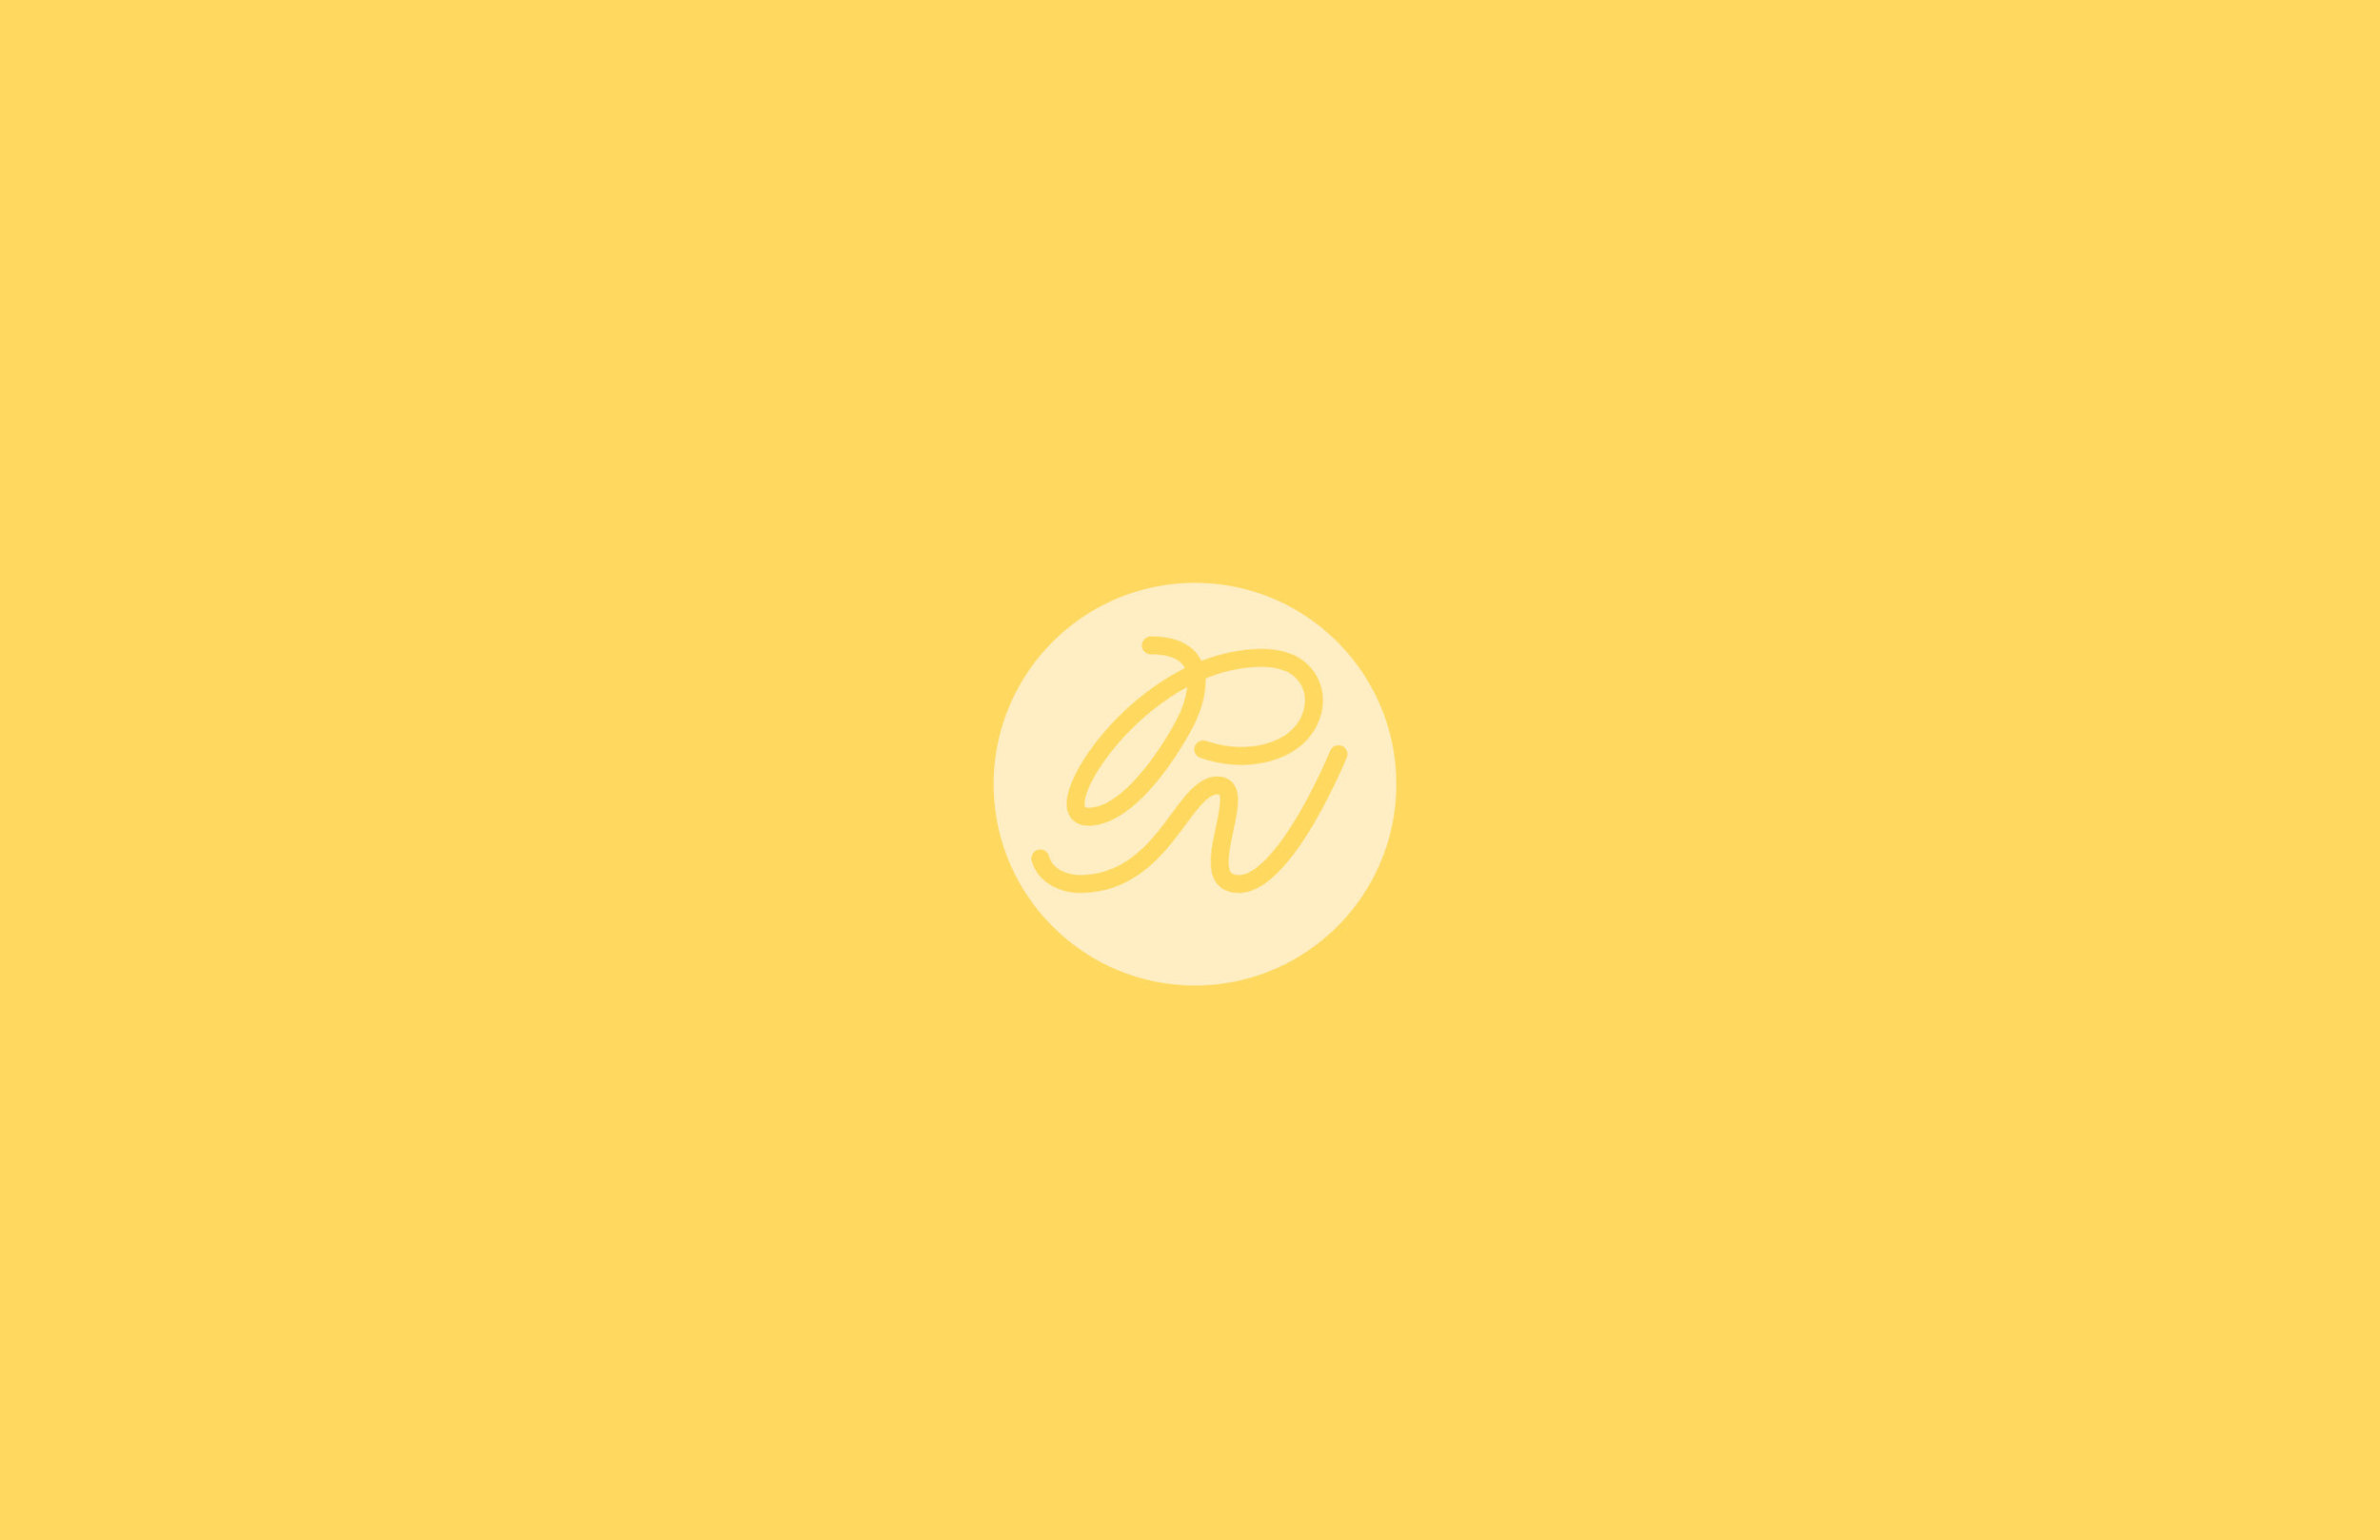 logo-design-branding-orange-county-marks-and-maker-phylicia-nicole-7.jpg